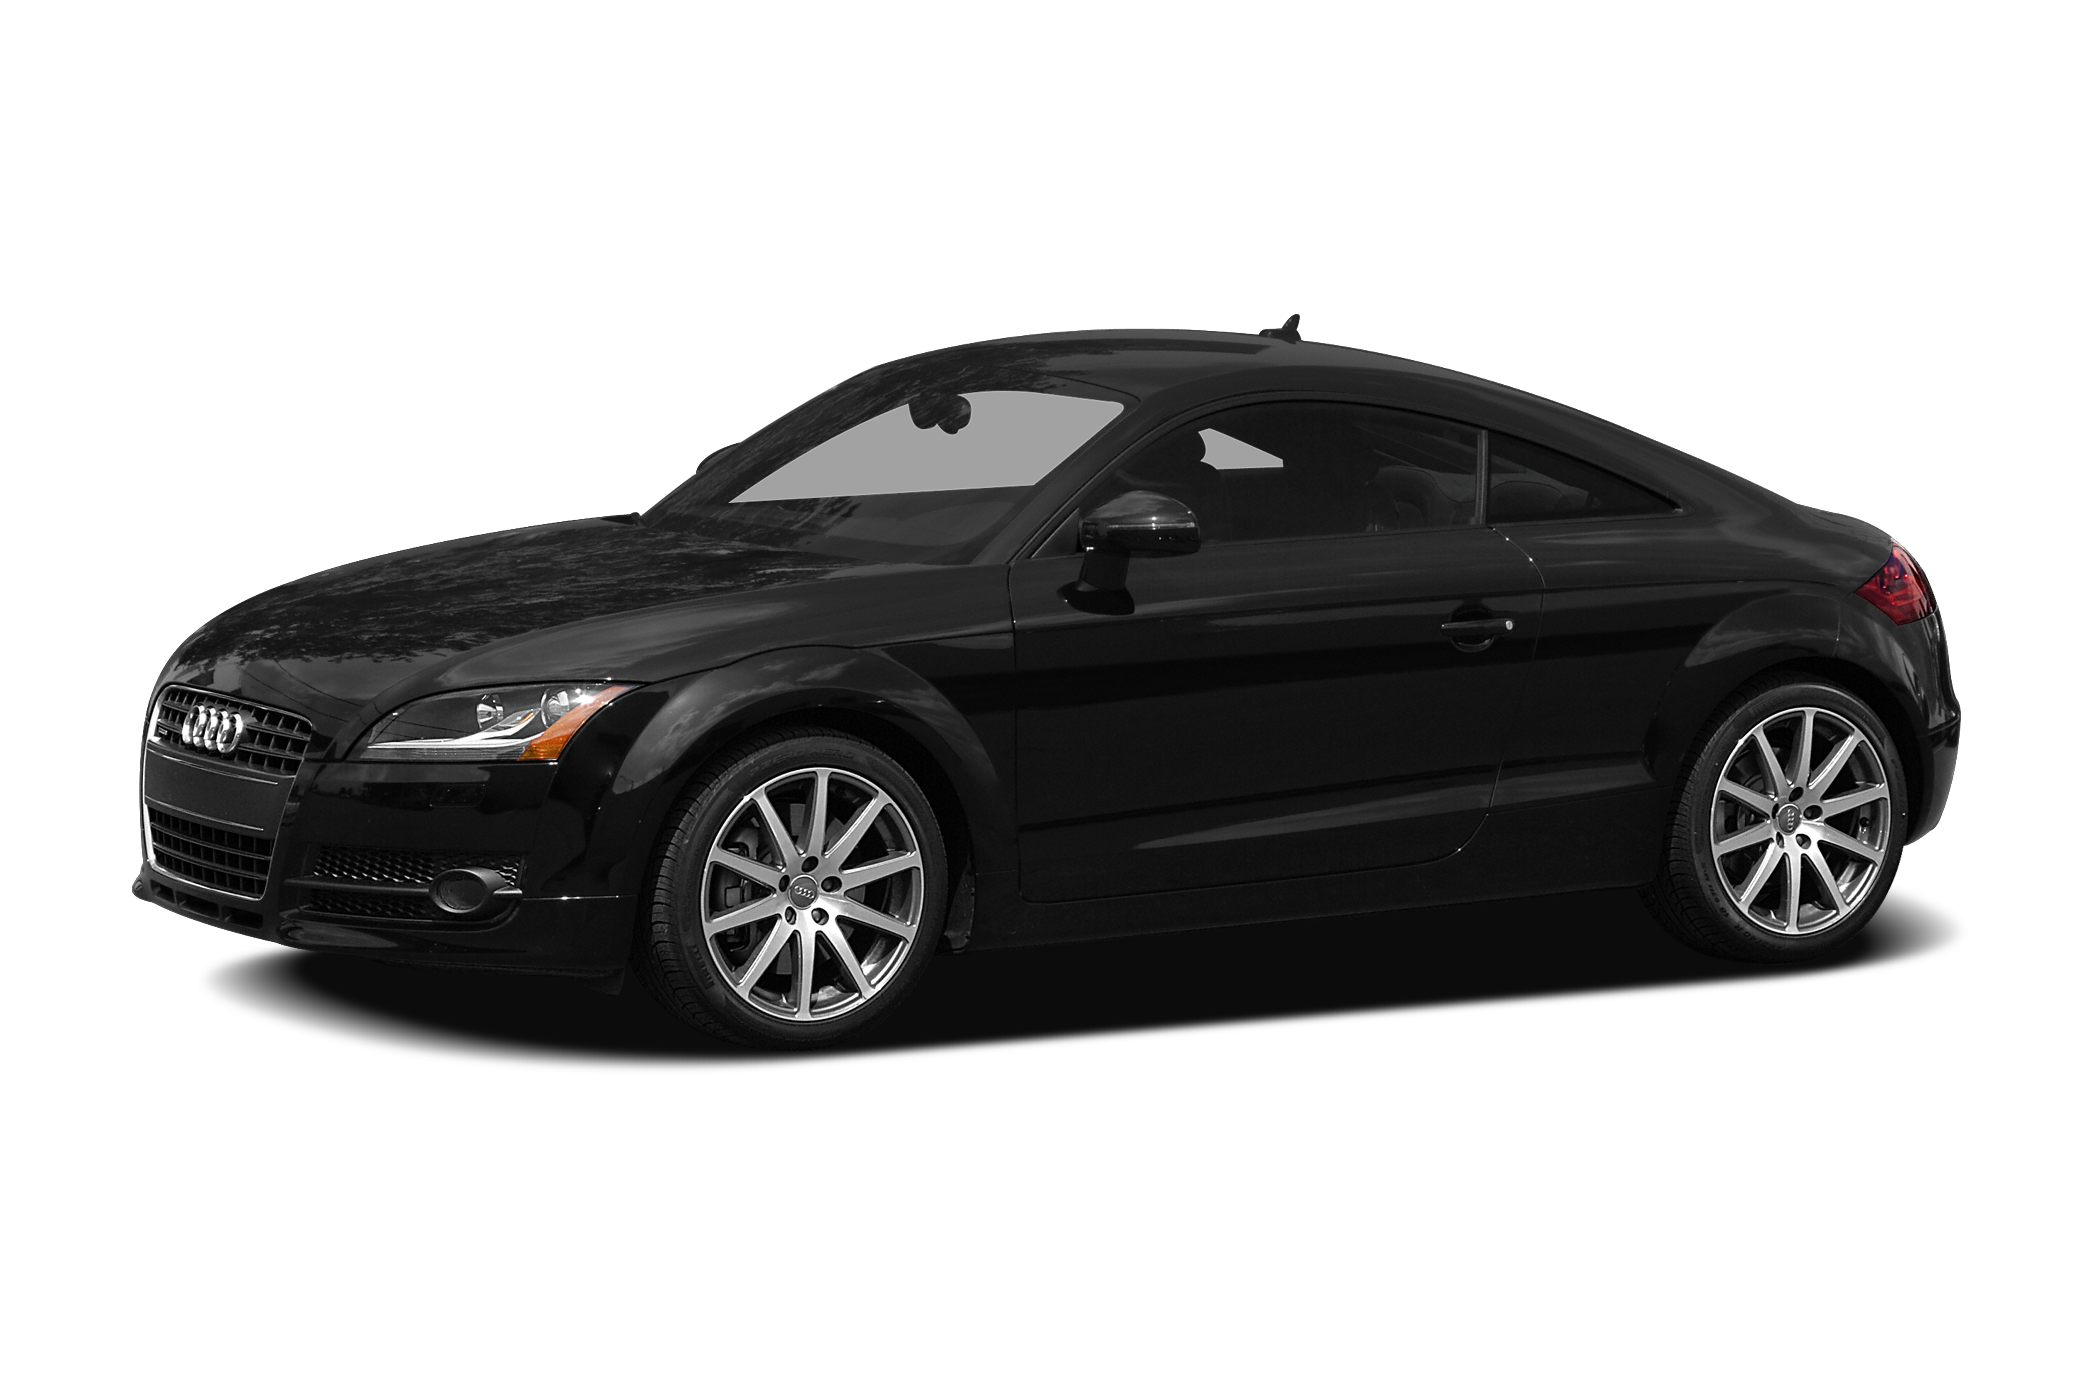 Kekurangan Audi Tt 2009 Review